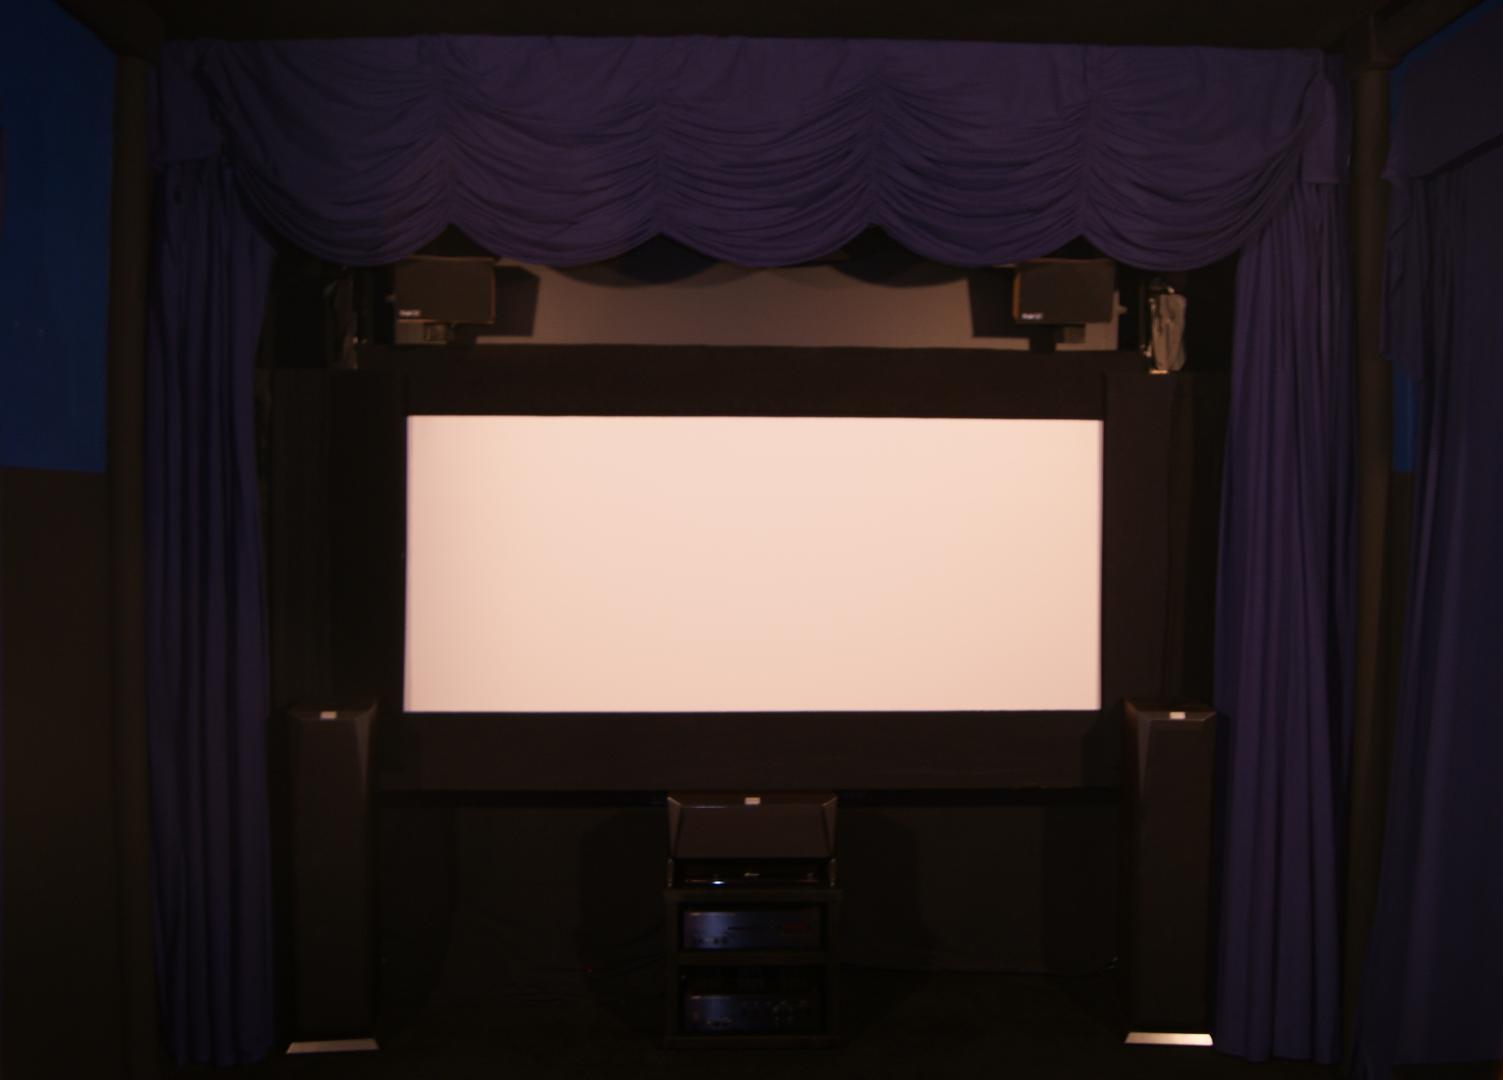 Picture 2 of Trarpalast - Berlin Screening Room inkl. Salon Flügel